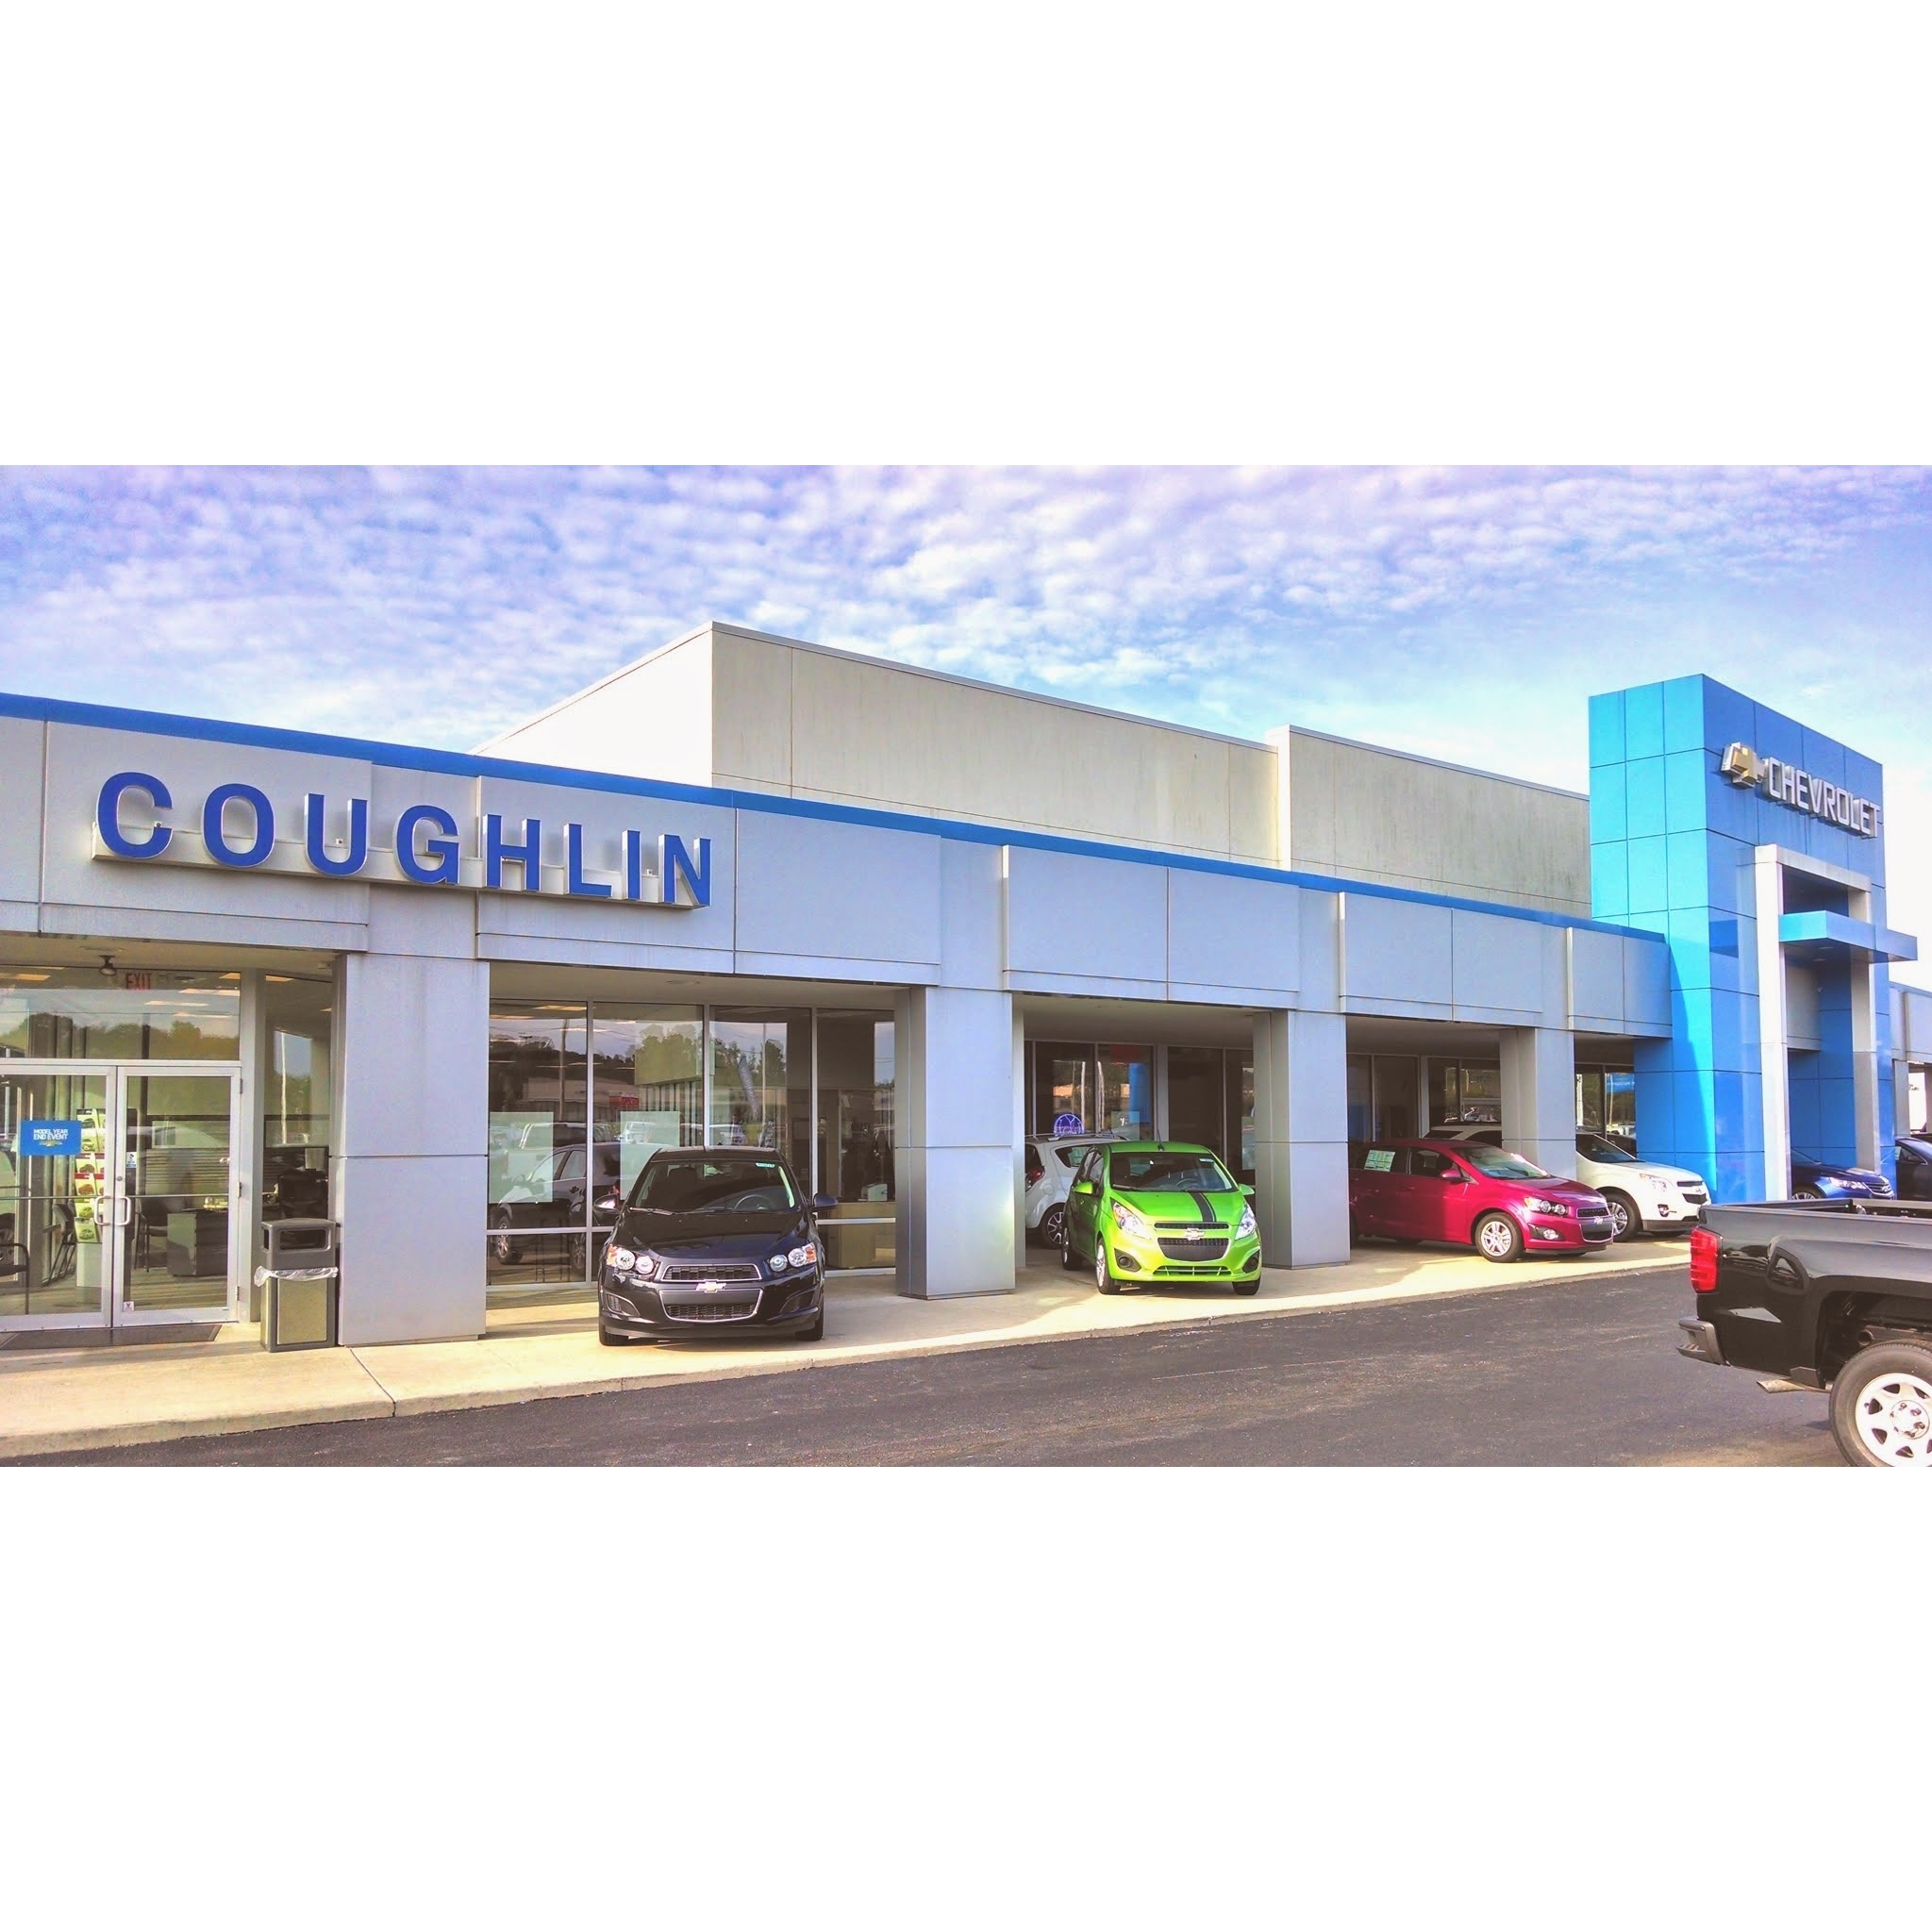 Coughlin Chevrolet of Pataskala - Pataskala, OH - Auto Dealers